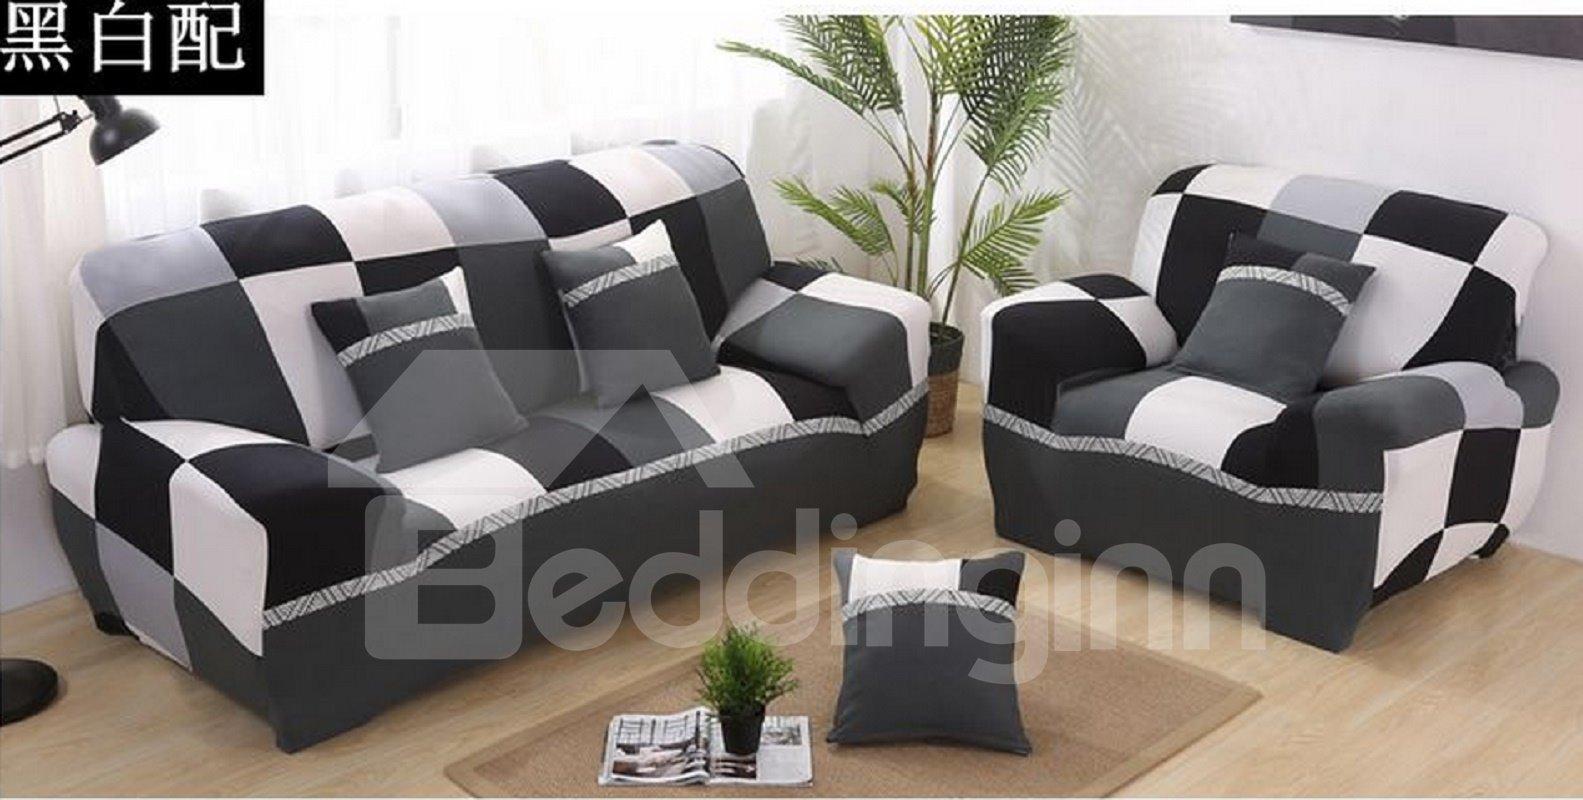 Black And White Pattern Anti Slip Water Resistant Sofa Slipcover